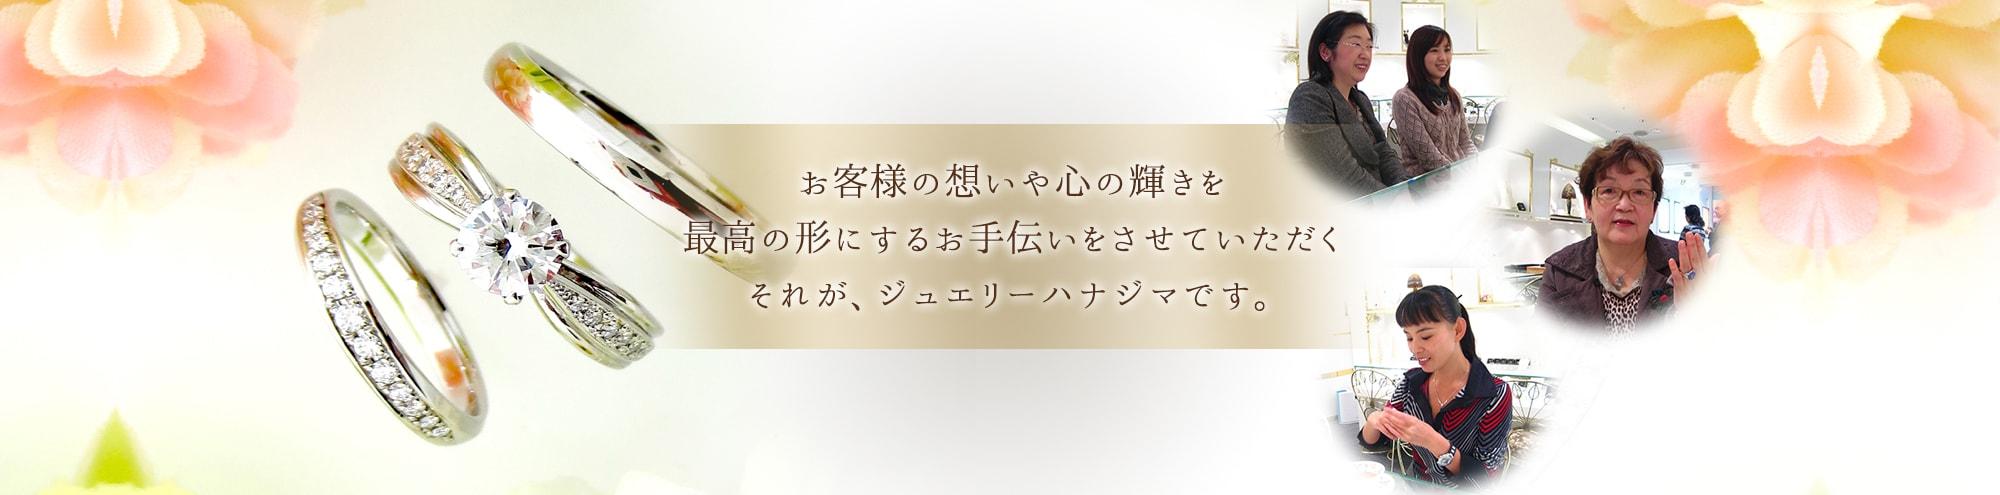 fv05-2